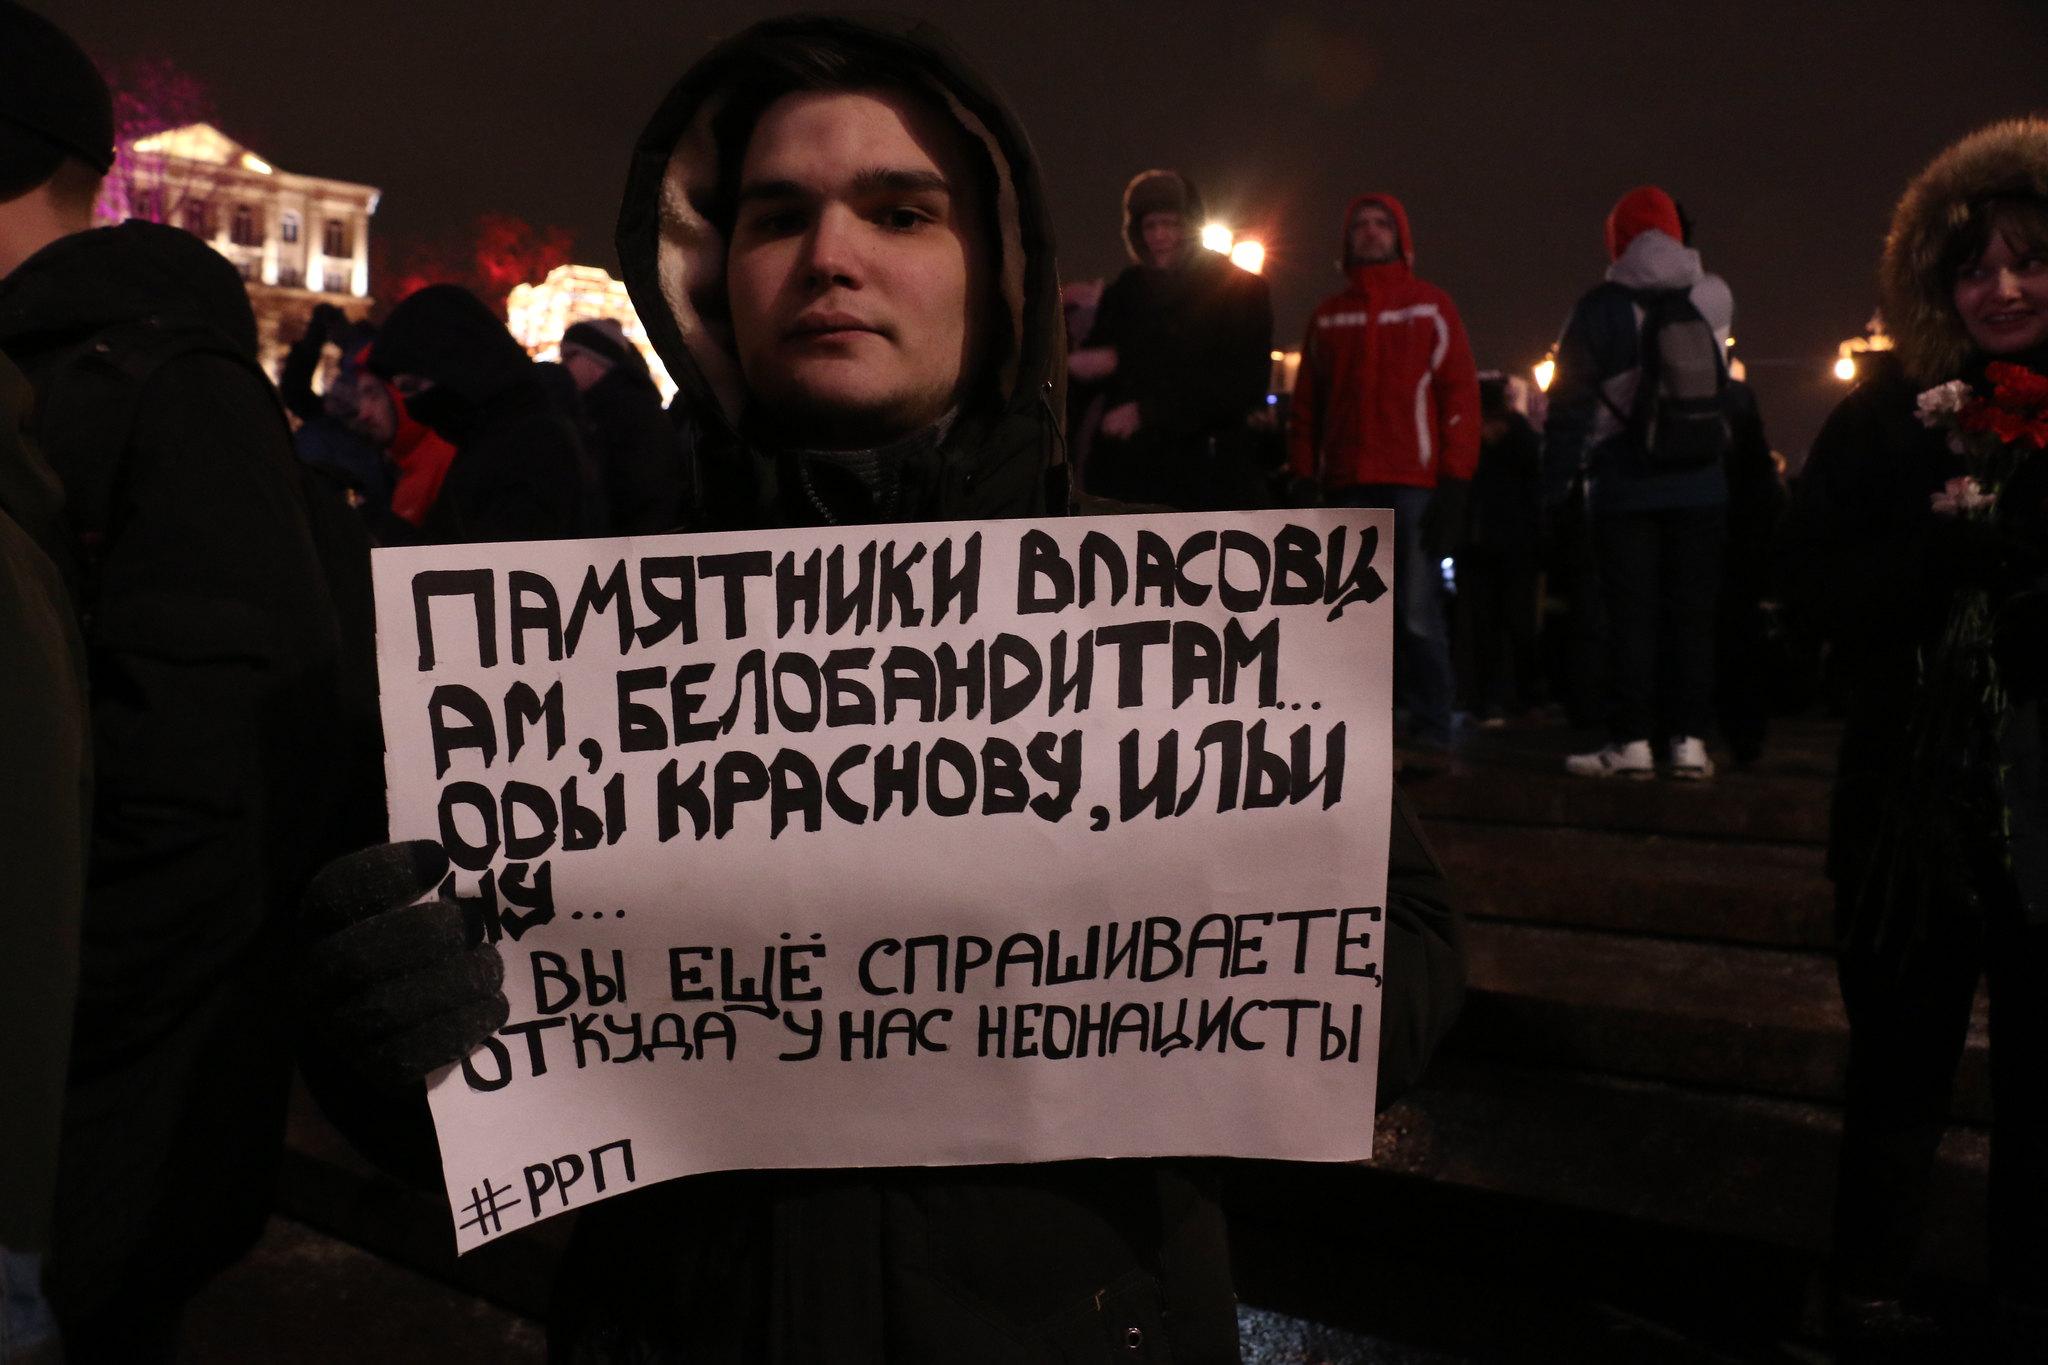 Фото by anatrrra, Москва, 19 января 2018 года